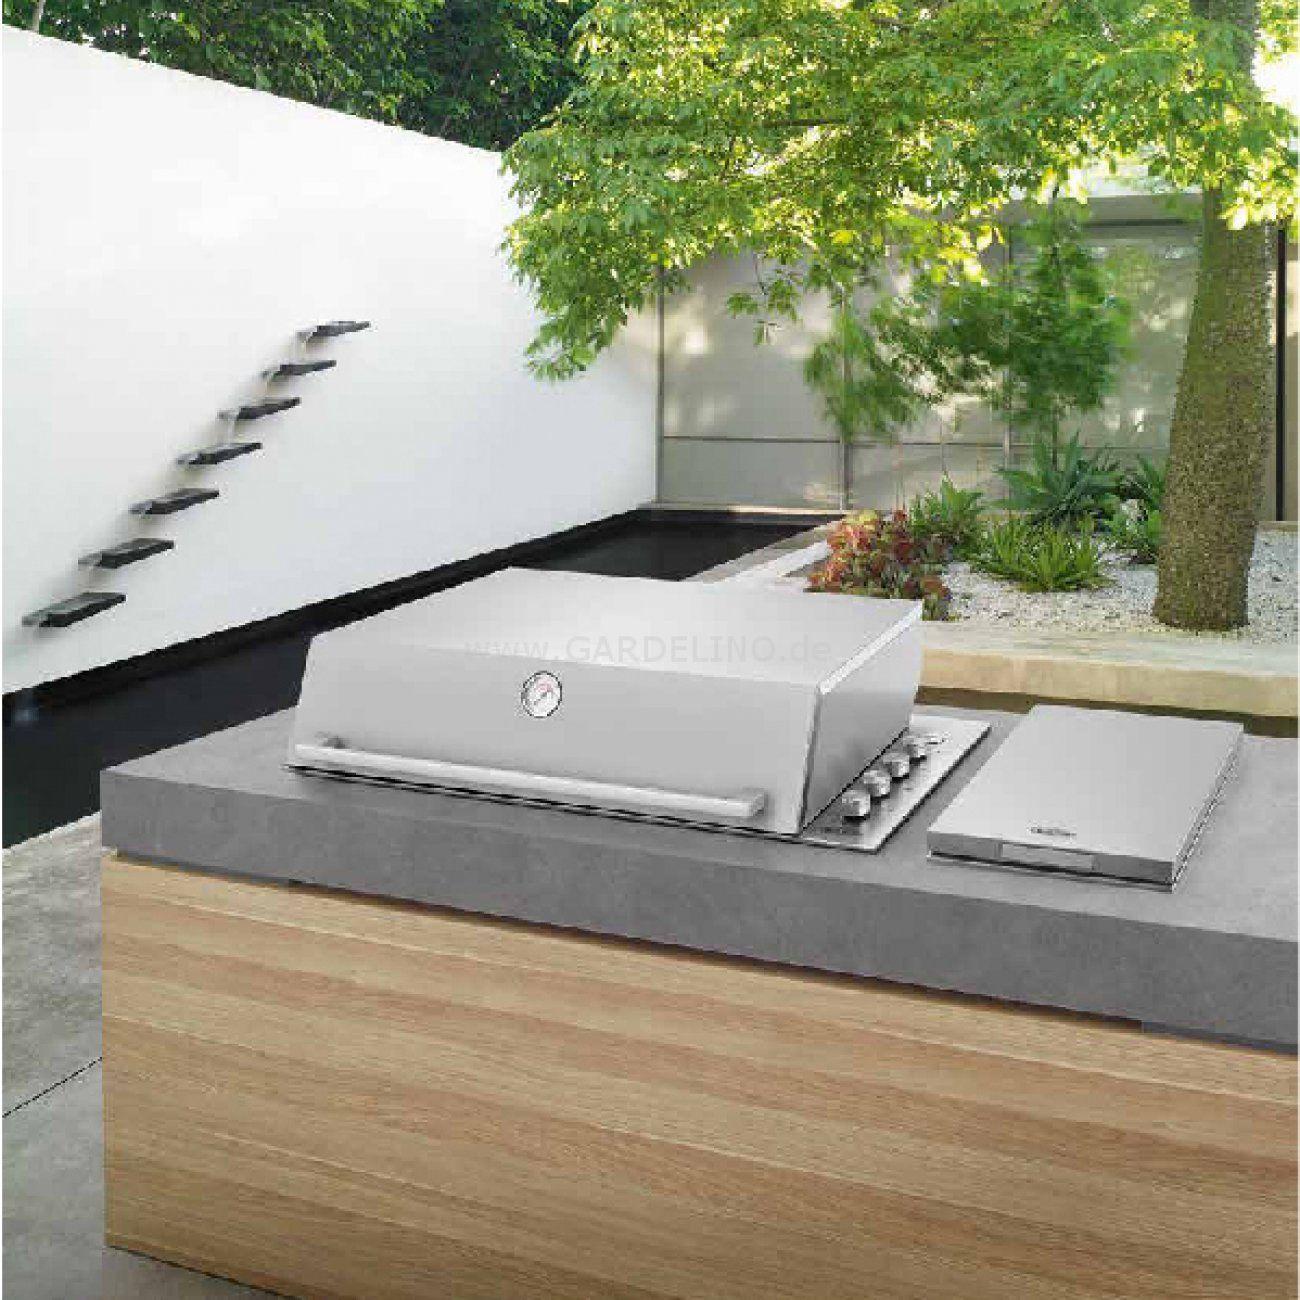 beefeater einbau gasgrill signature proline outdoor k che outdoor und au enk che selber bauen. Black Bedroom Furniture Sets. Home Design Ideas